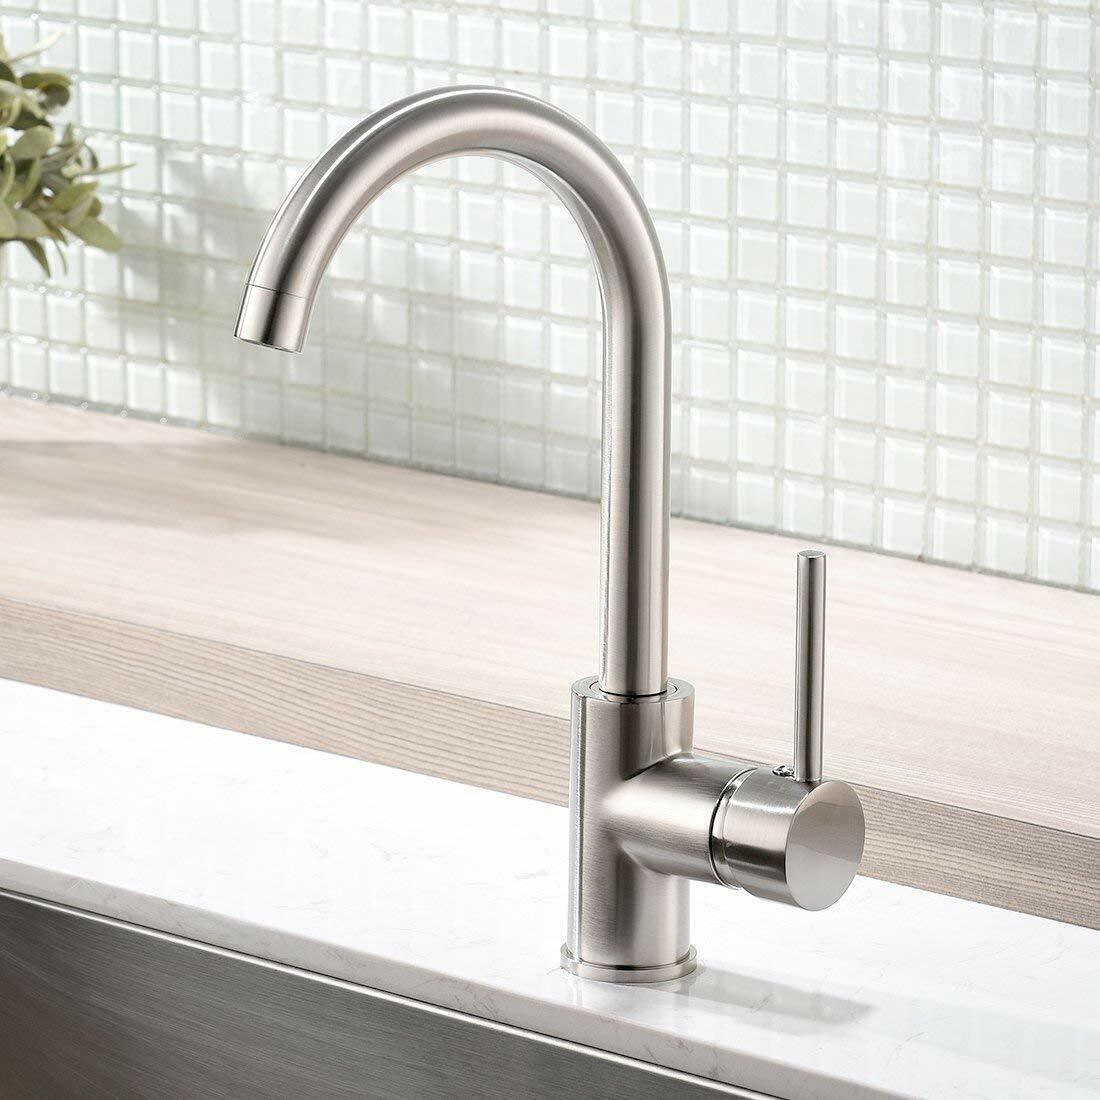 Modern Bar Sink Faucet Kitchen Sink Single Handle Brush Nickle Prep Sink  Faucets